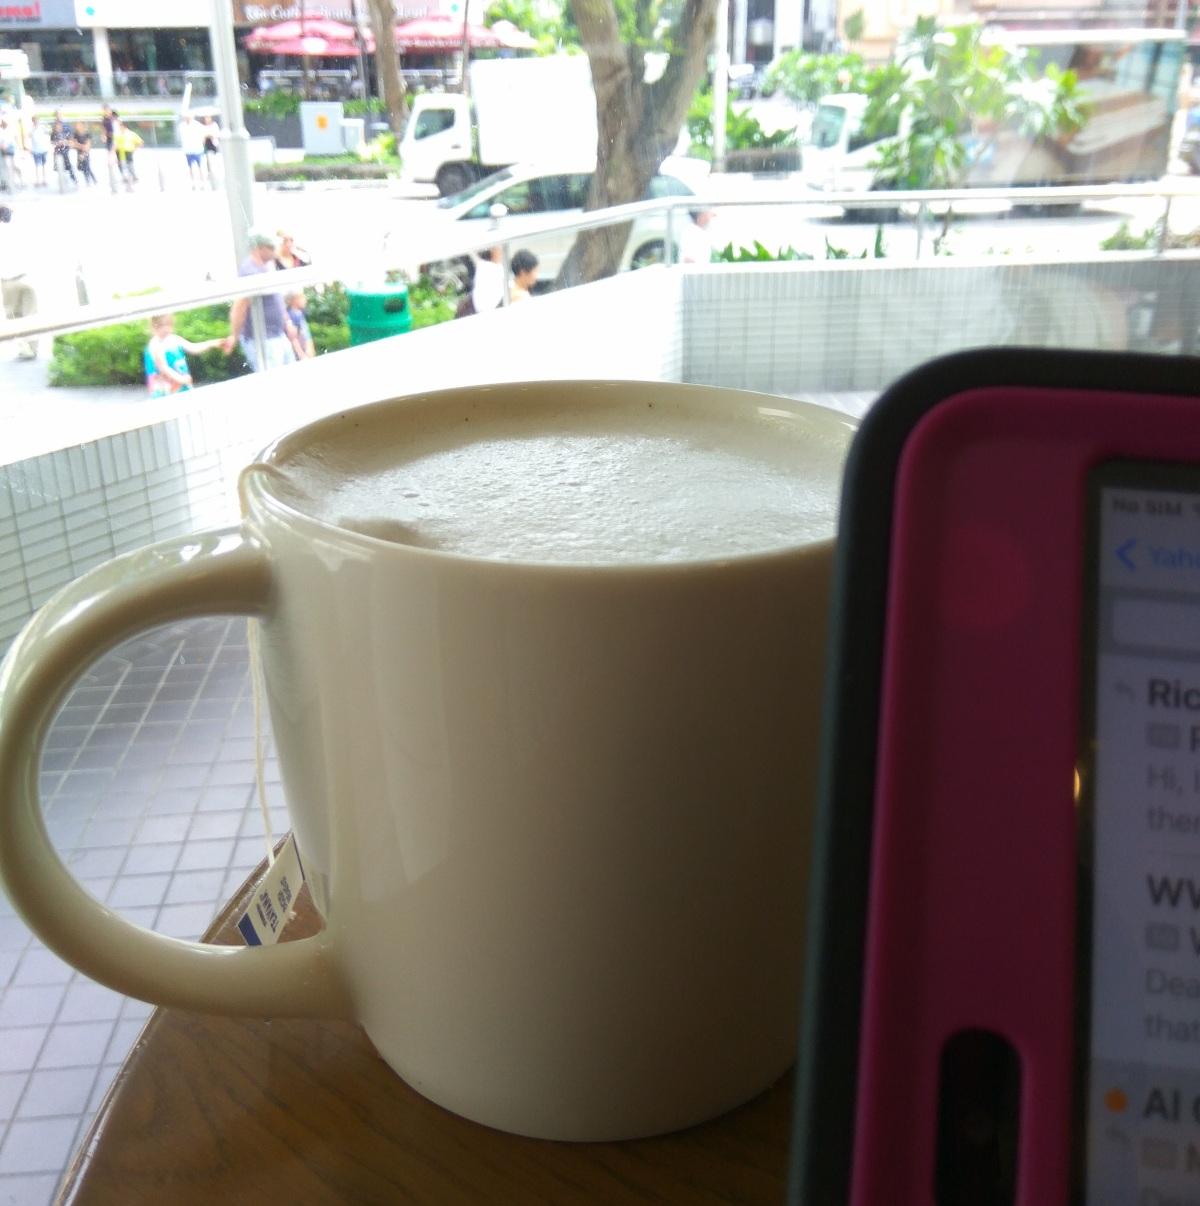 Enjoying a cup oftea